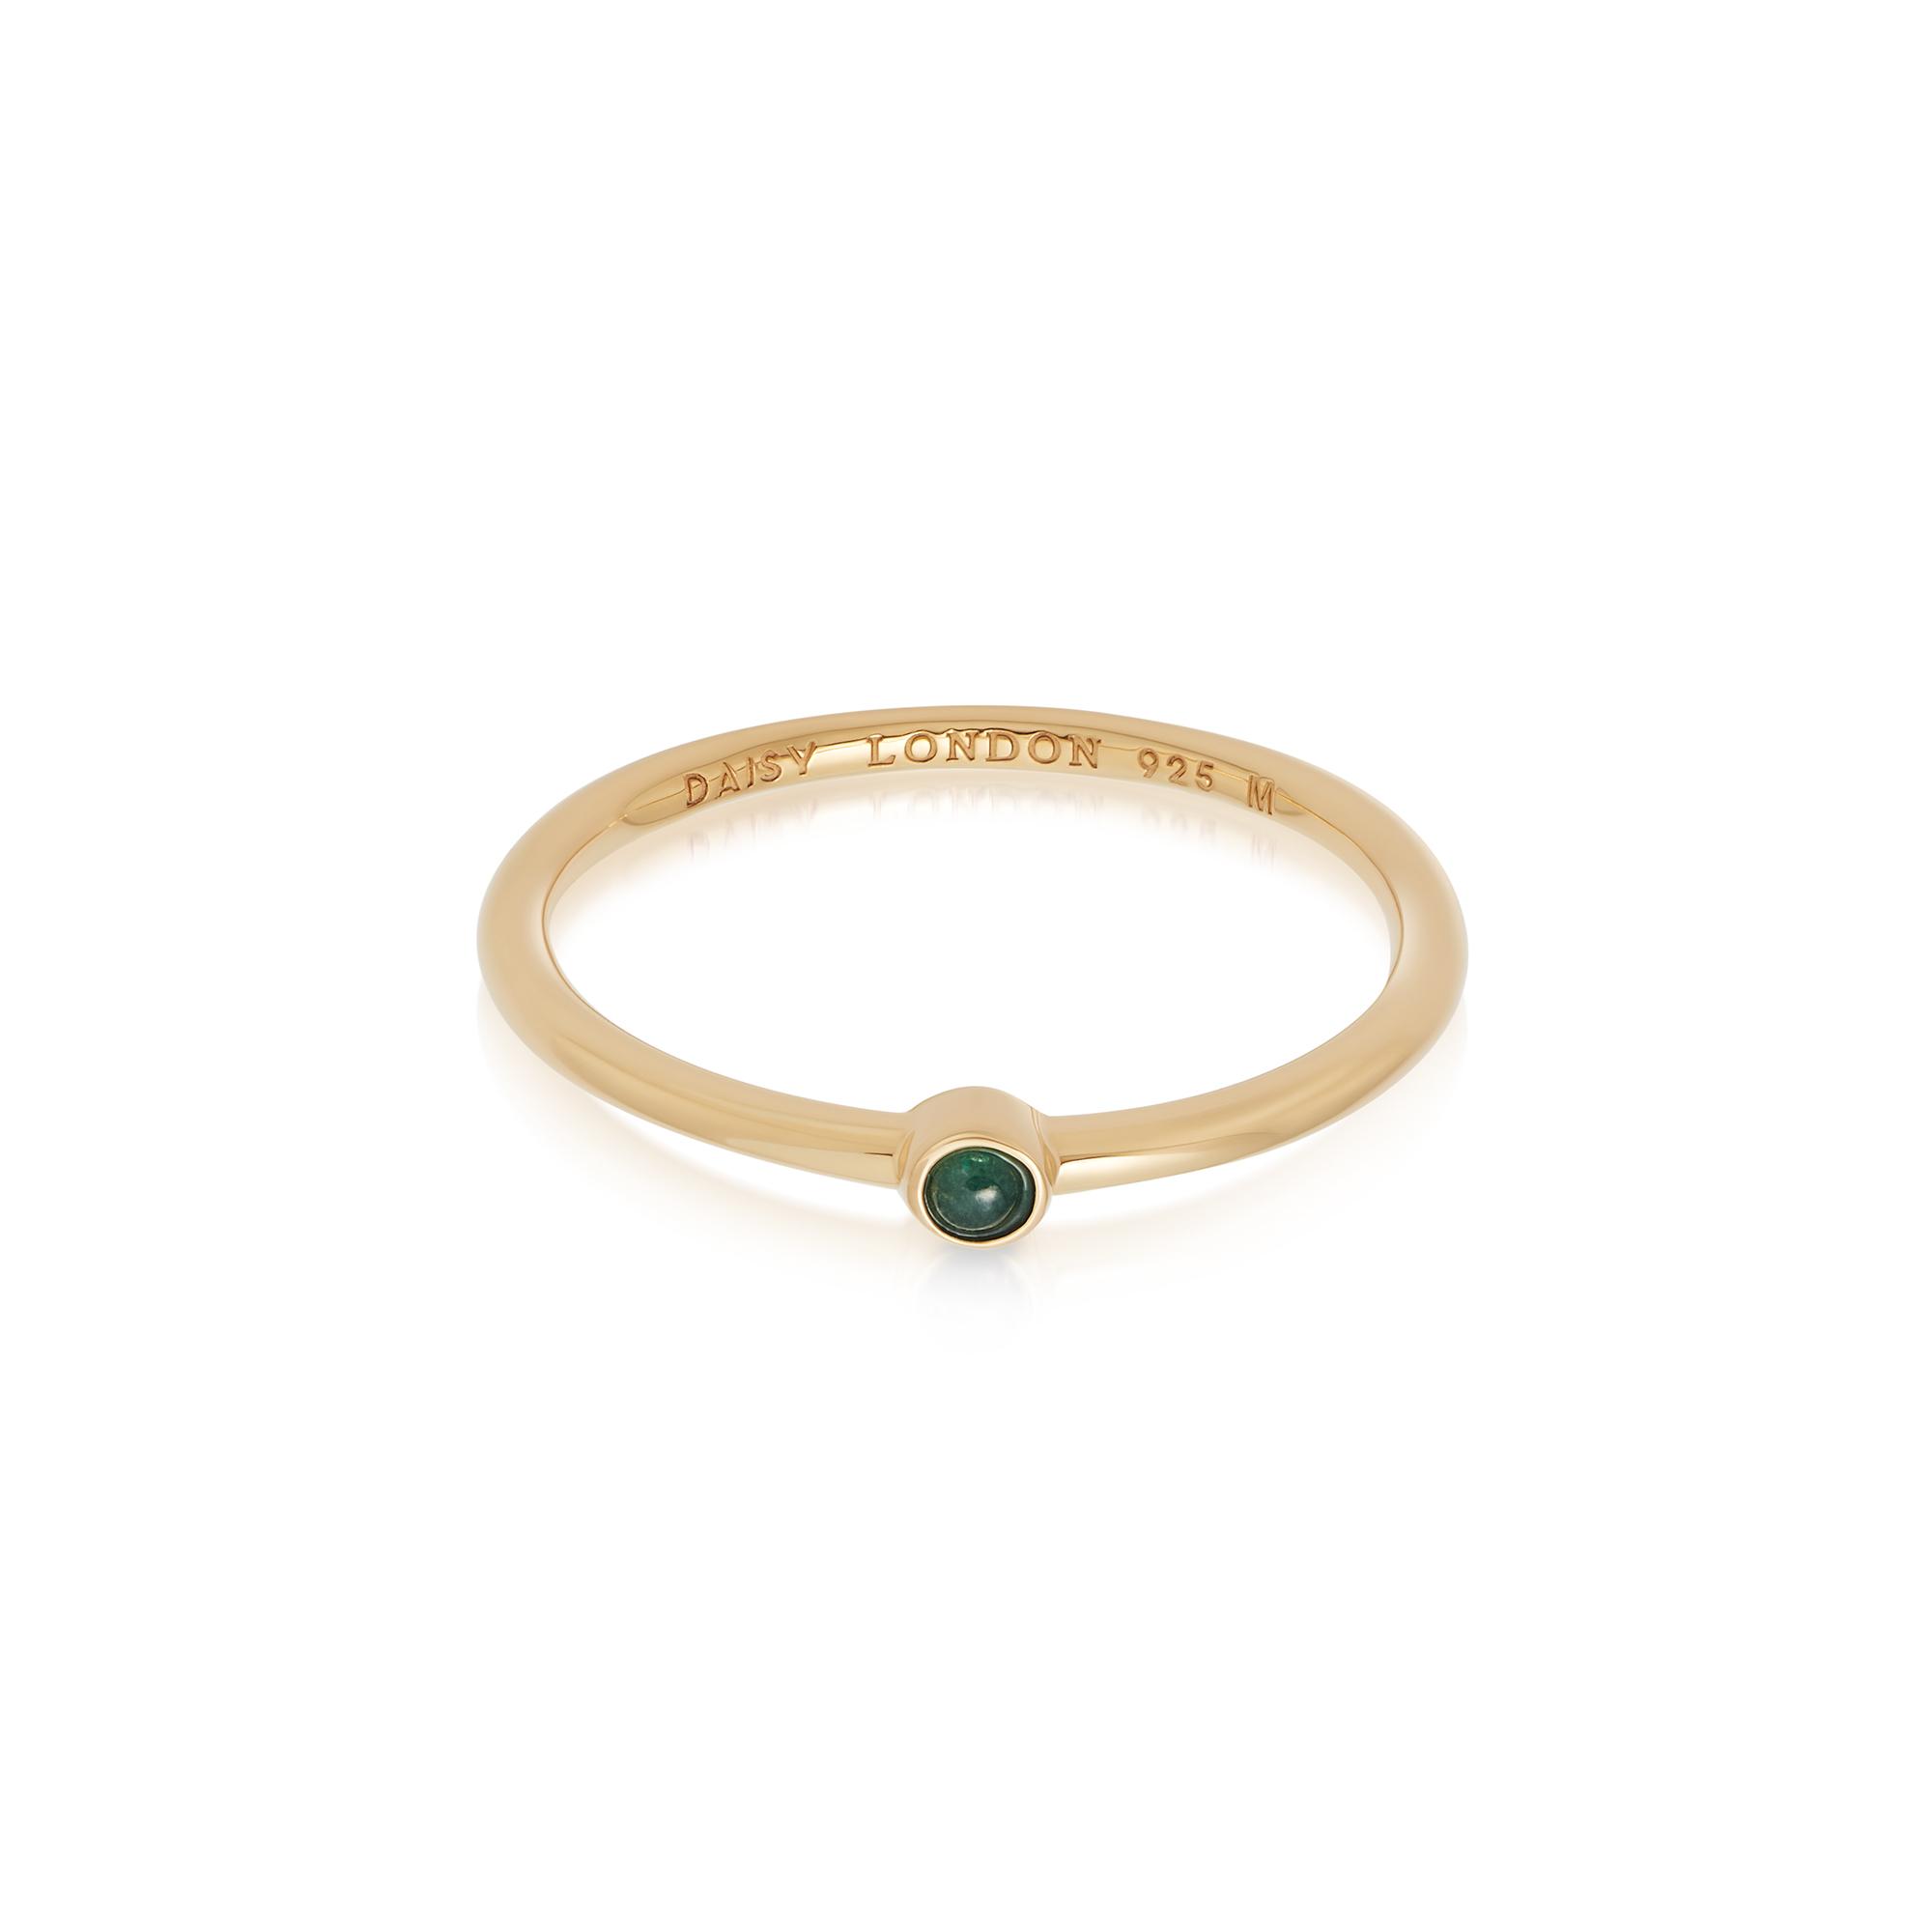 Green Aventurine Healing Stone Ring 18Ct Gold Plate L